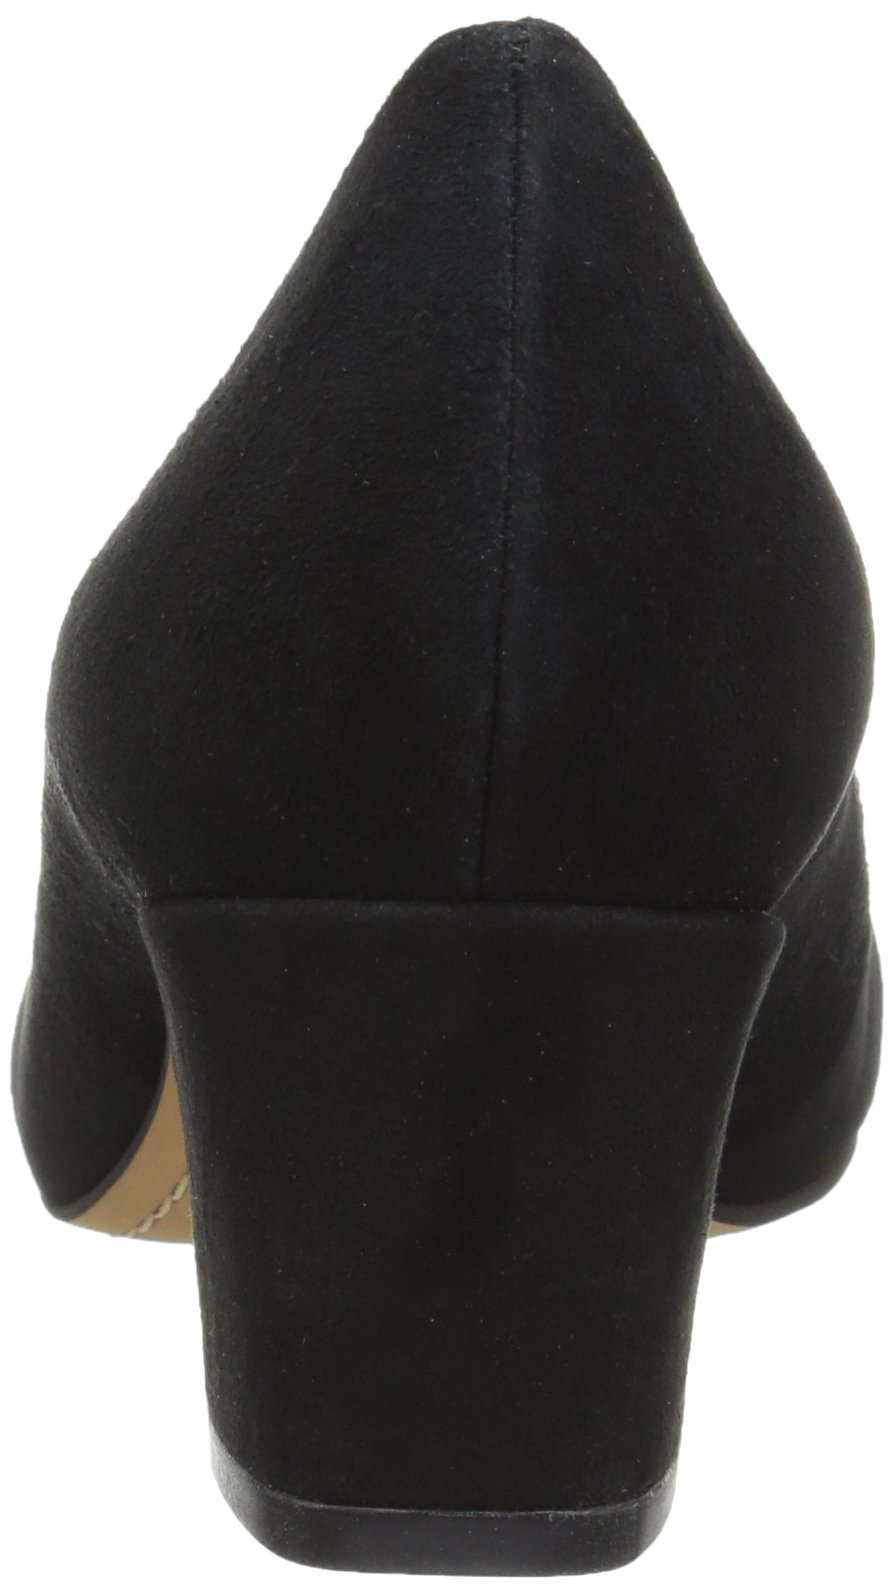 206 Collective Women's Merritt Round Toe Block Heel Low Pump, Black Suede, 7.5 B US by 206 Collective (Image #2)